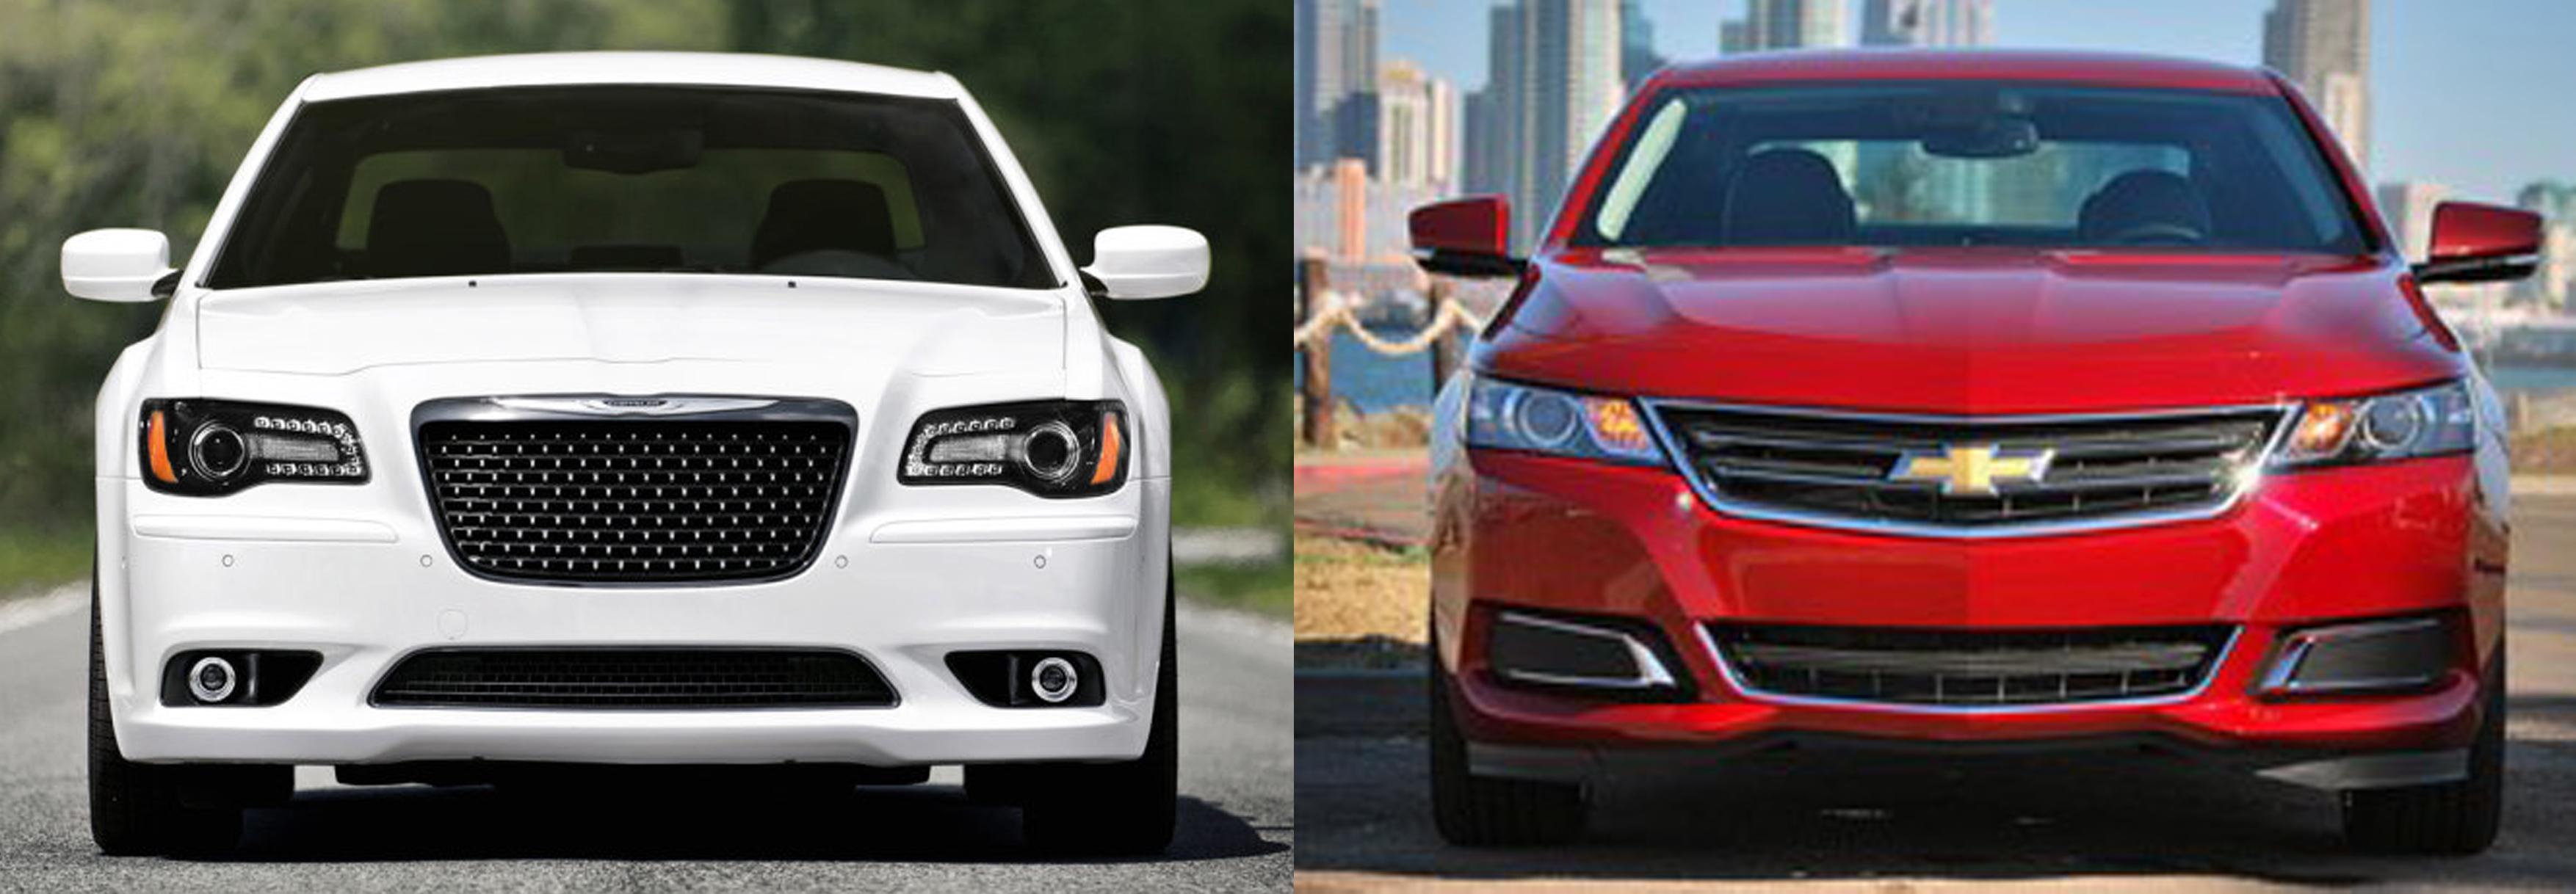 Kelebihan Kekurangan Chevrolet Chrysler Review